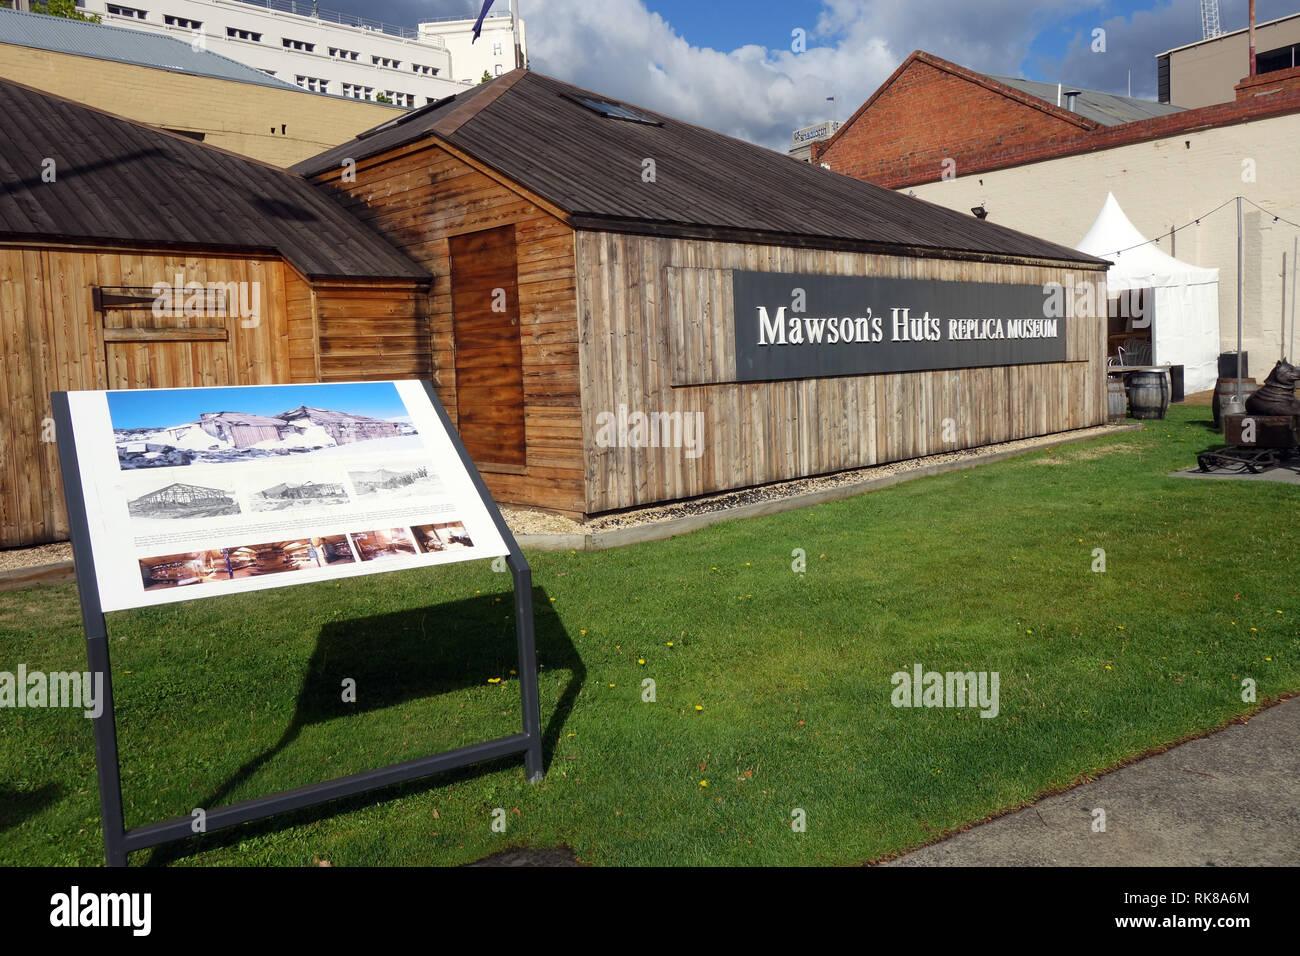 Mawson's Hut Replica Museum, Hobart, Tasmania, Australia. No PR - Stock Image